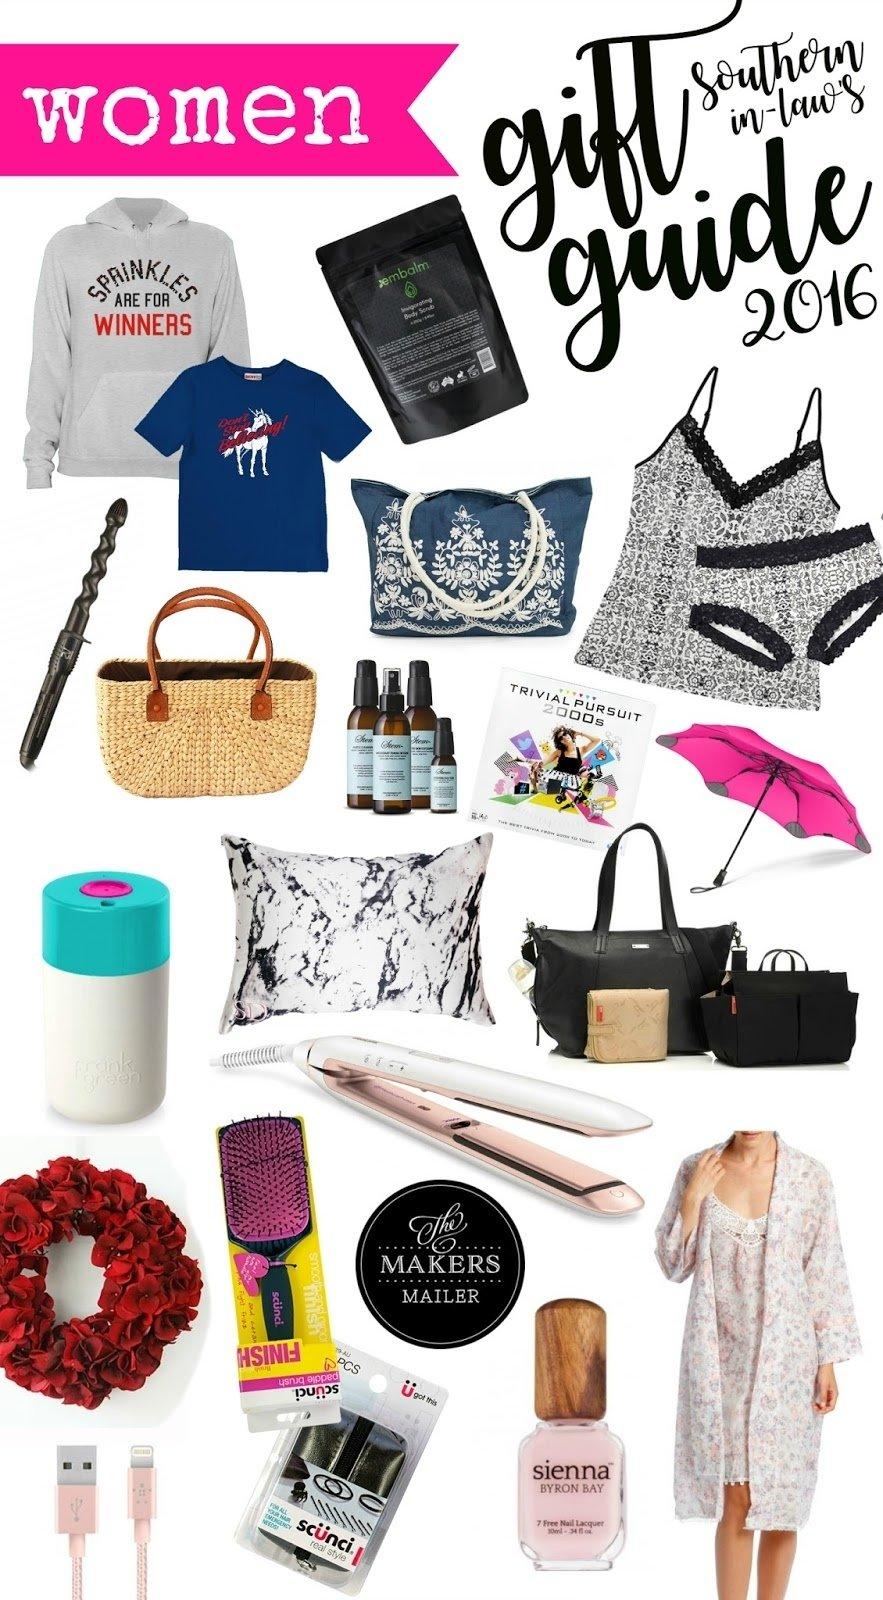 10 Wonderful Birthday Present Ideas For Her 2016 womens christmas gift guide christmas gift guide stocking 10 2020